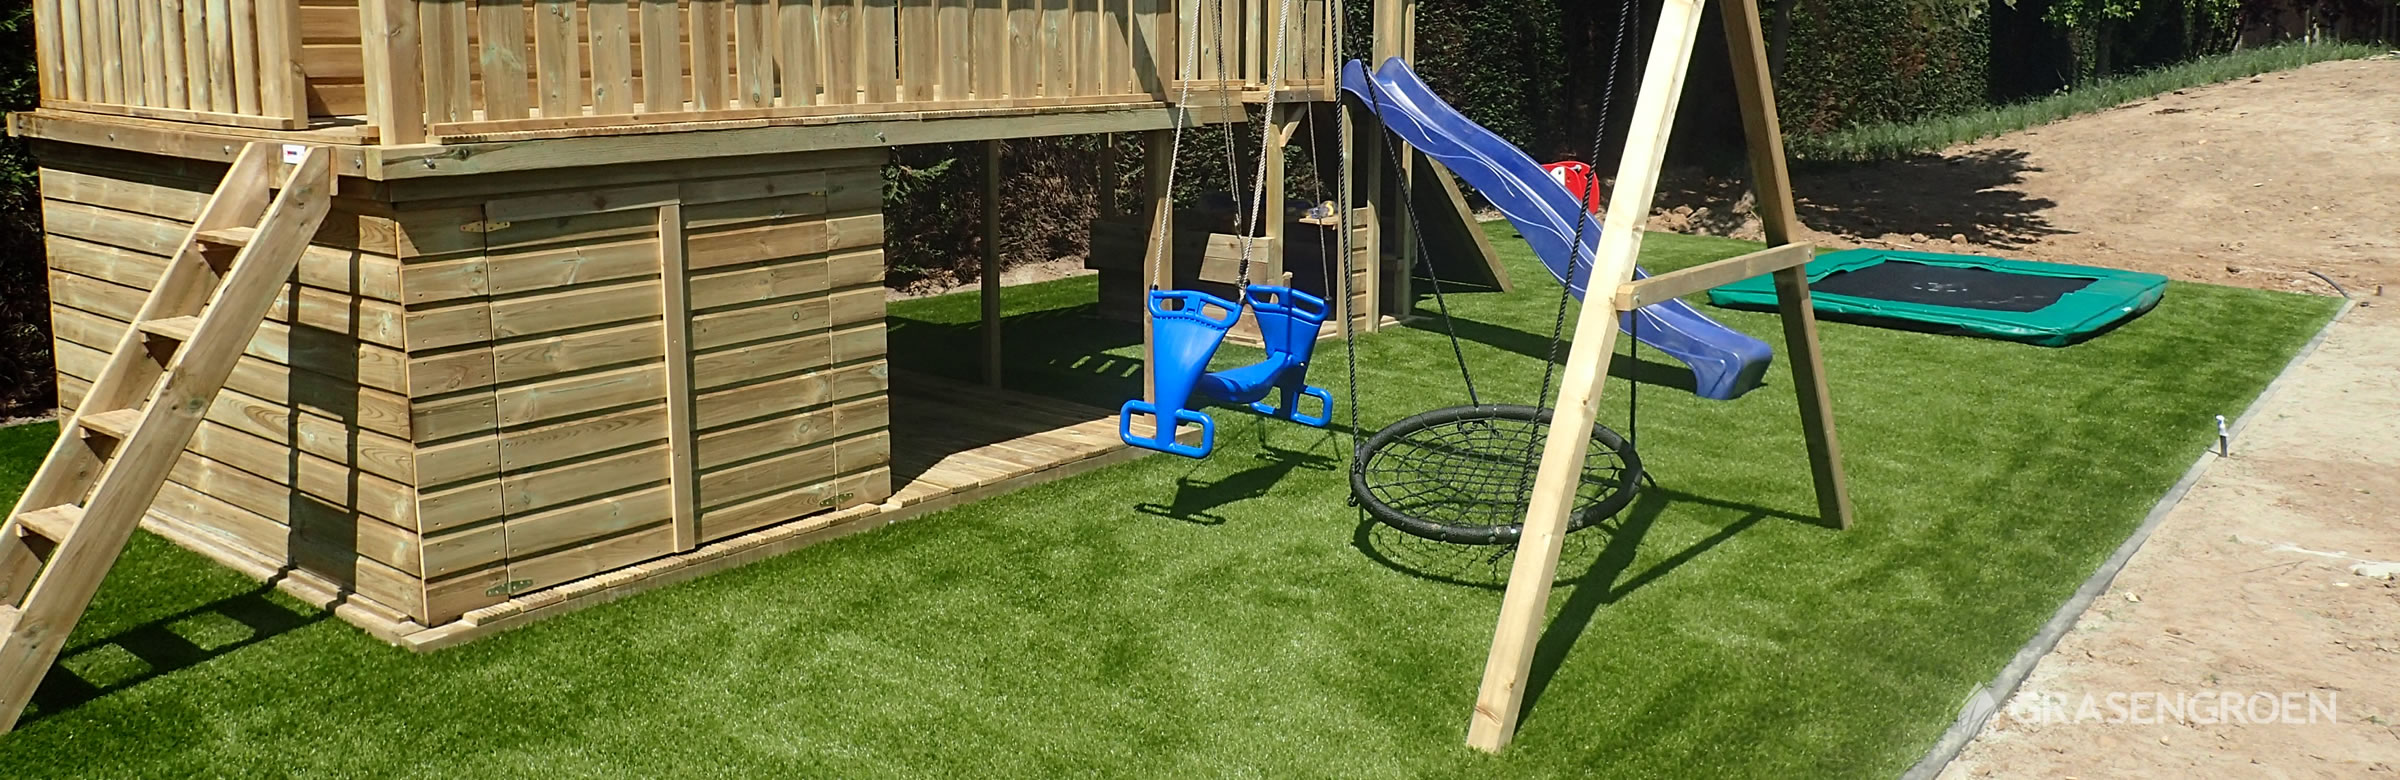 Kunstgrasleggenmaaseik1 • Gras en Groen Kunstgras